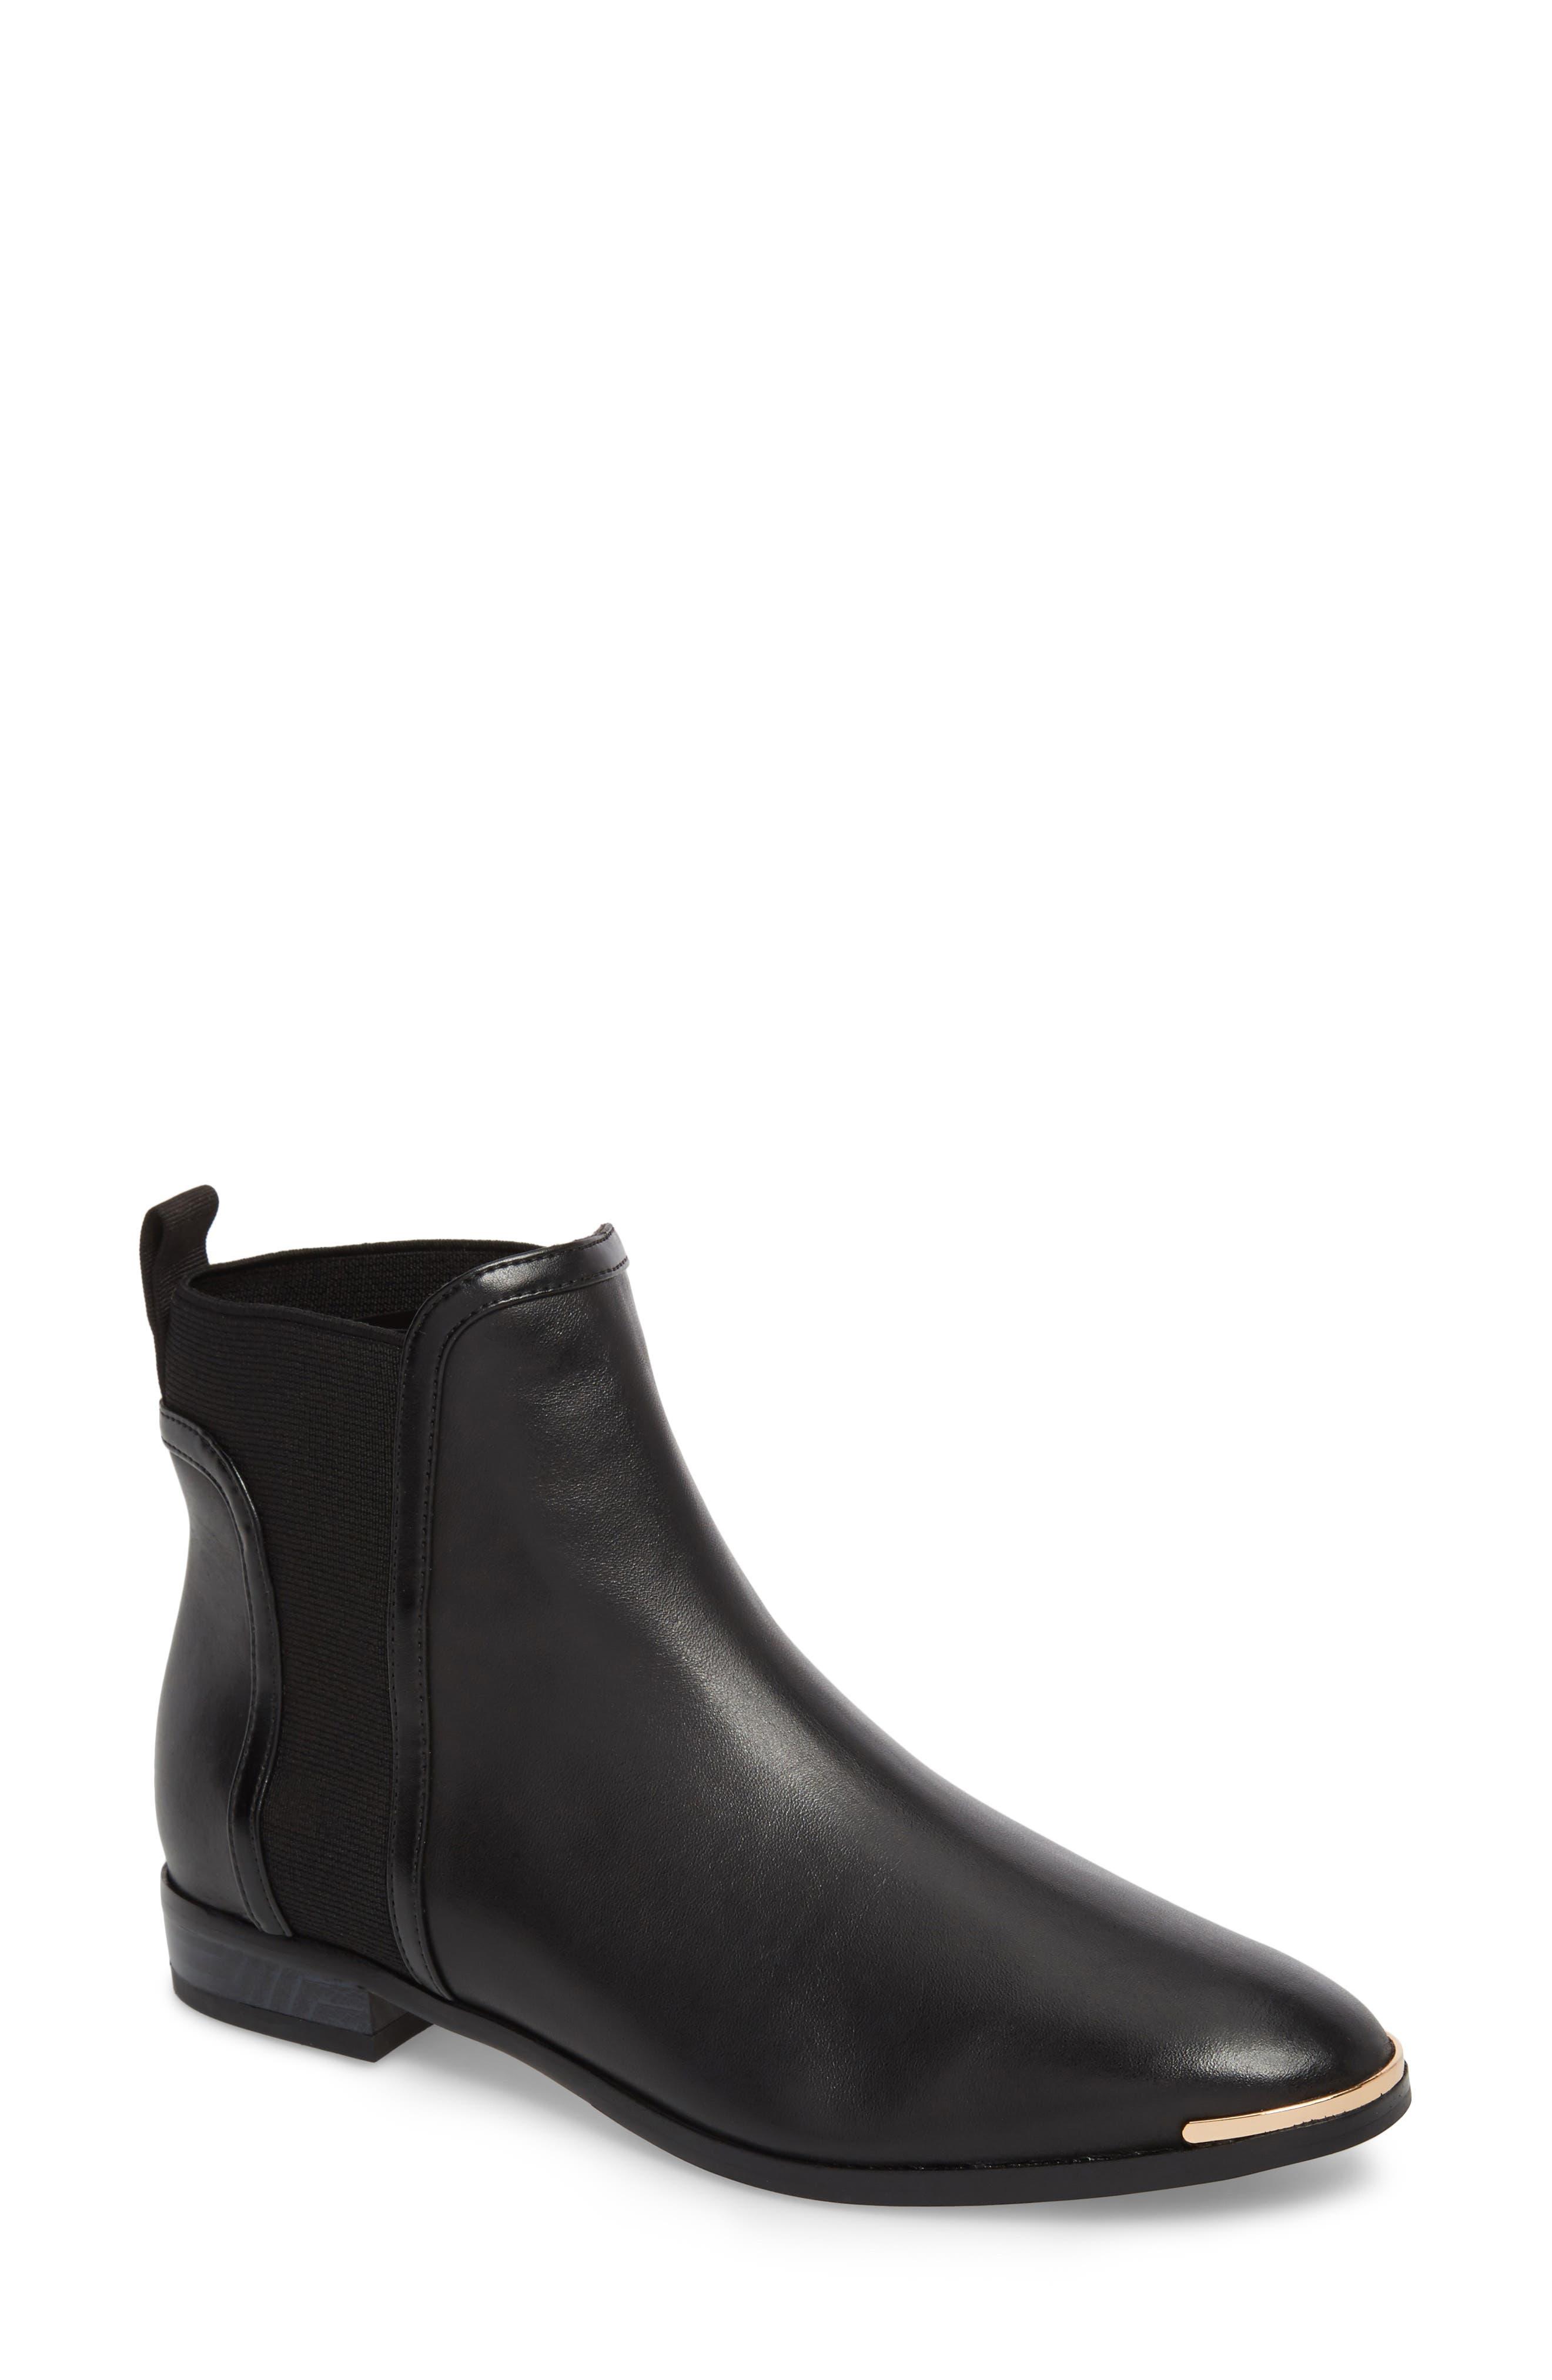 Kerei Chelsea Boot,                             Main thumbnail 1, color,                             Black Leather